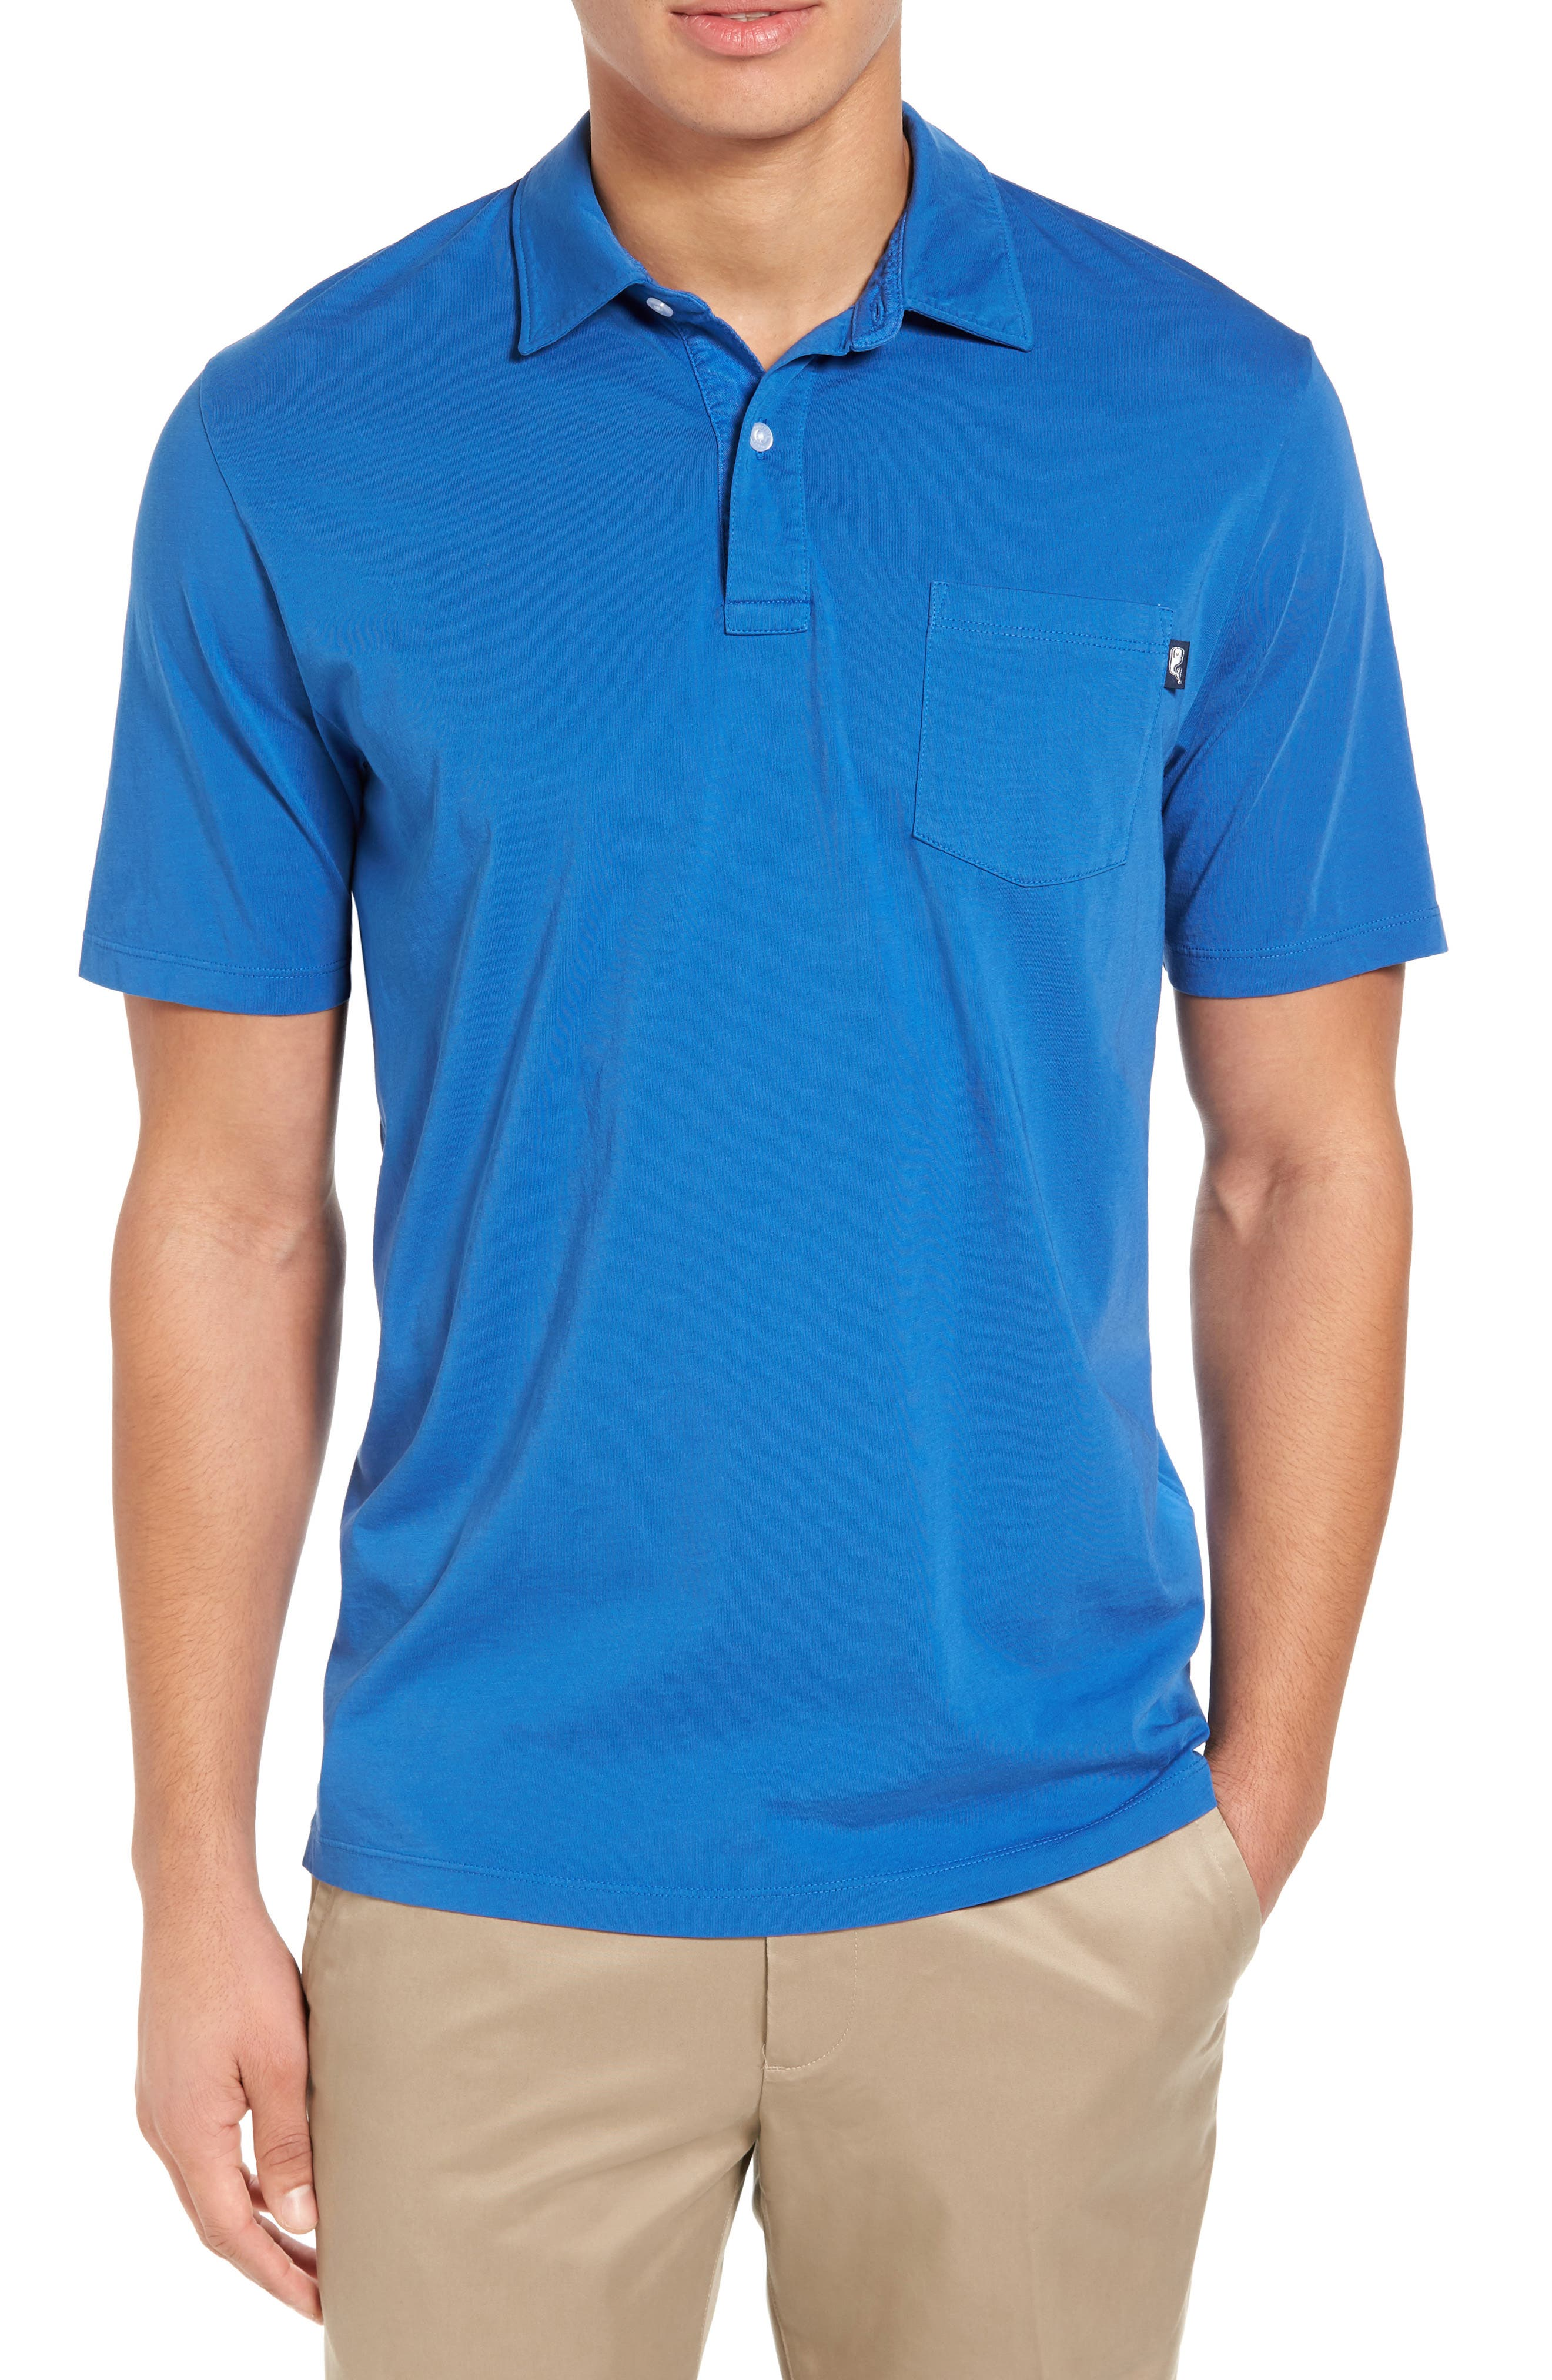 Vineyard Vines Garment Dyed Jersey Polo